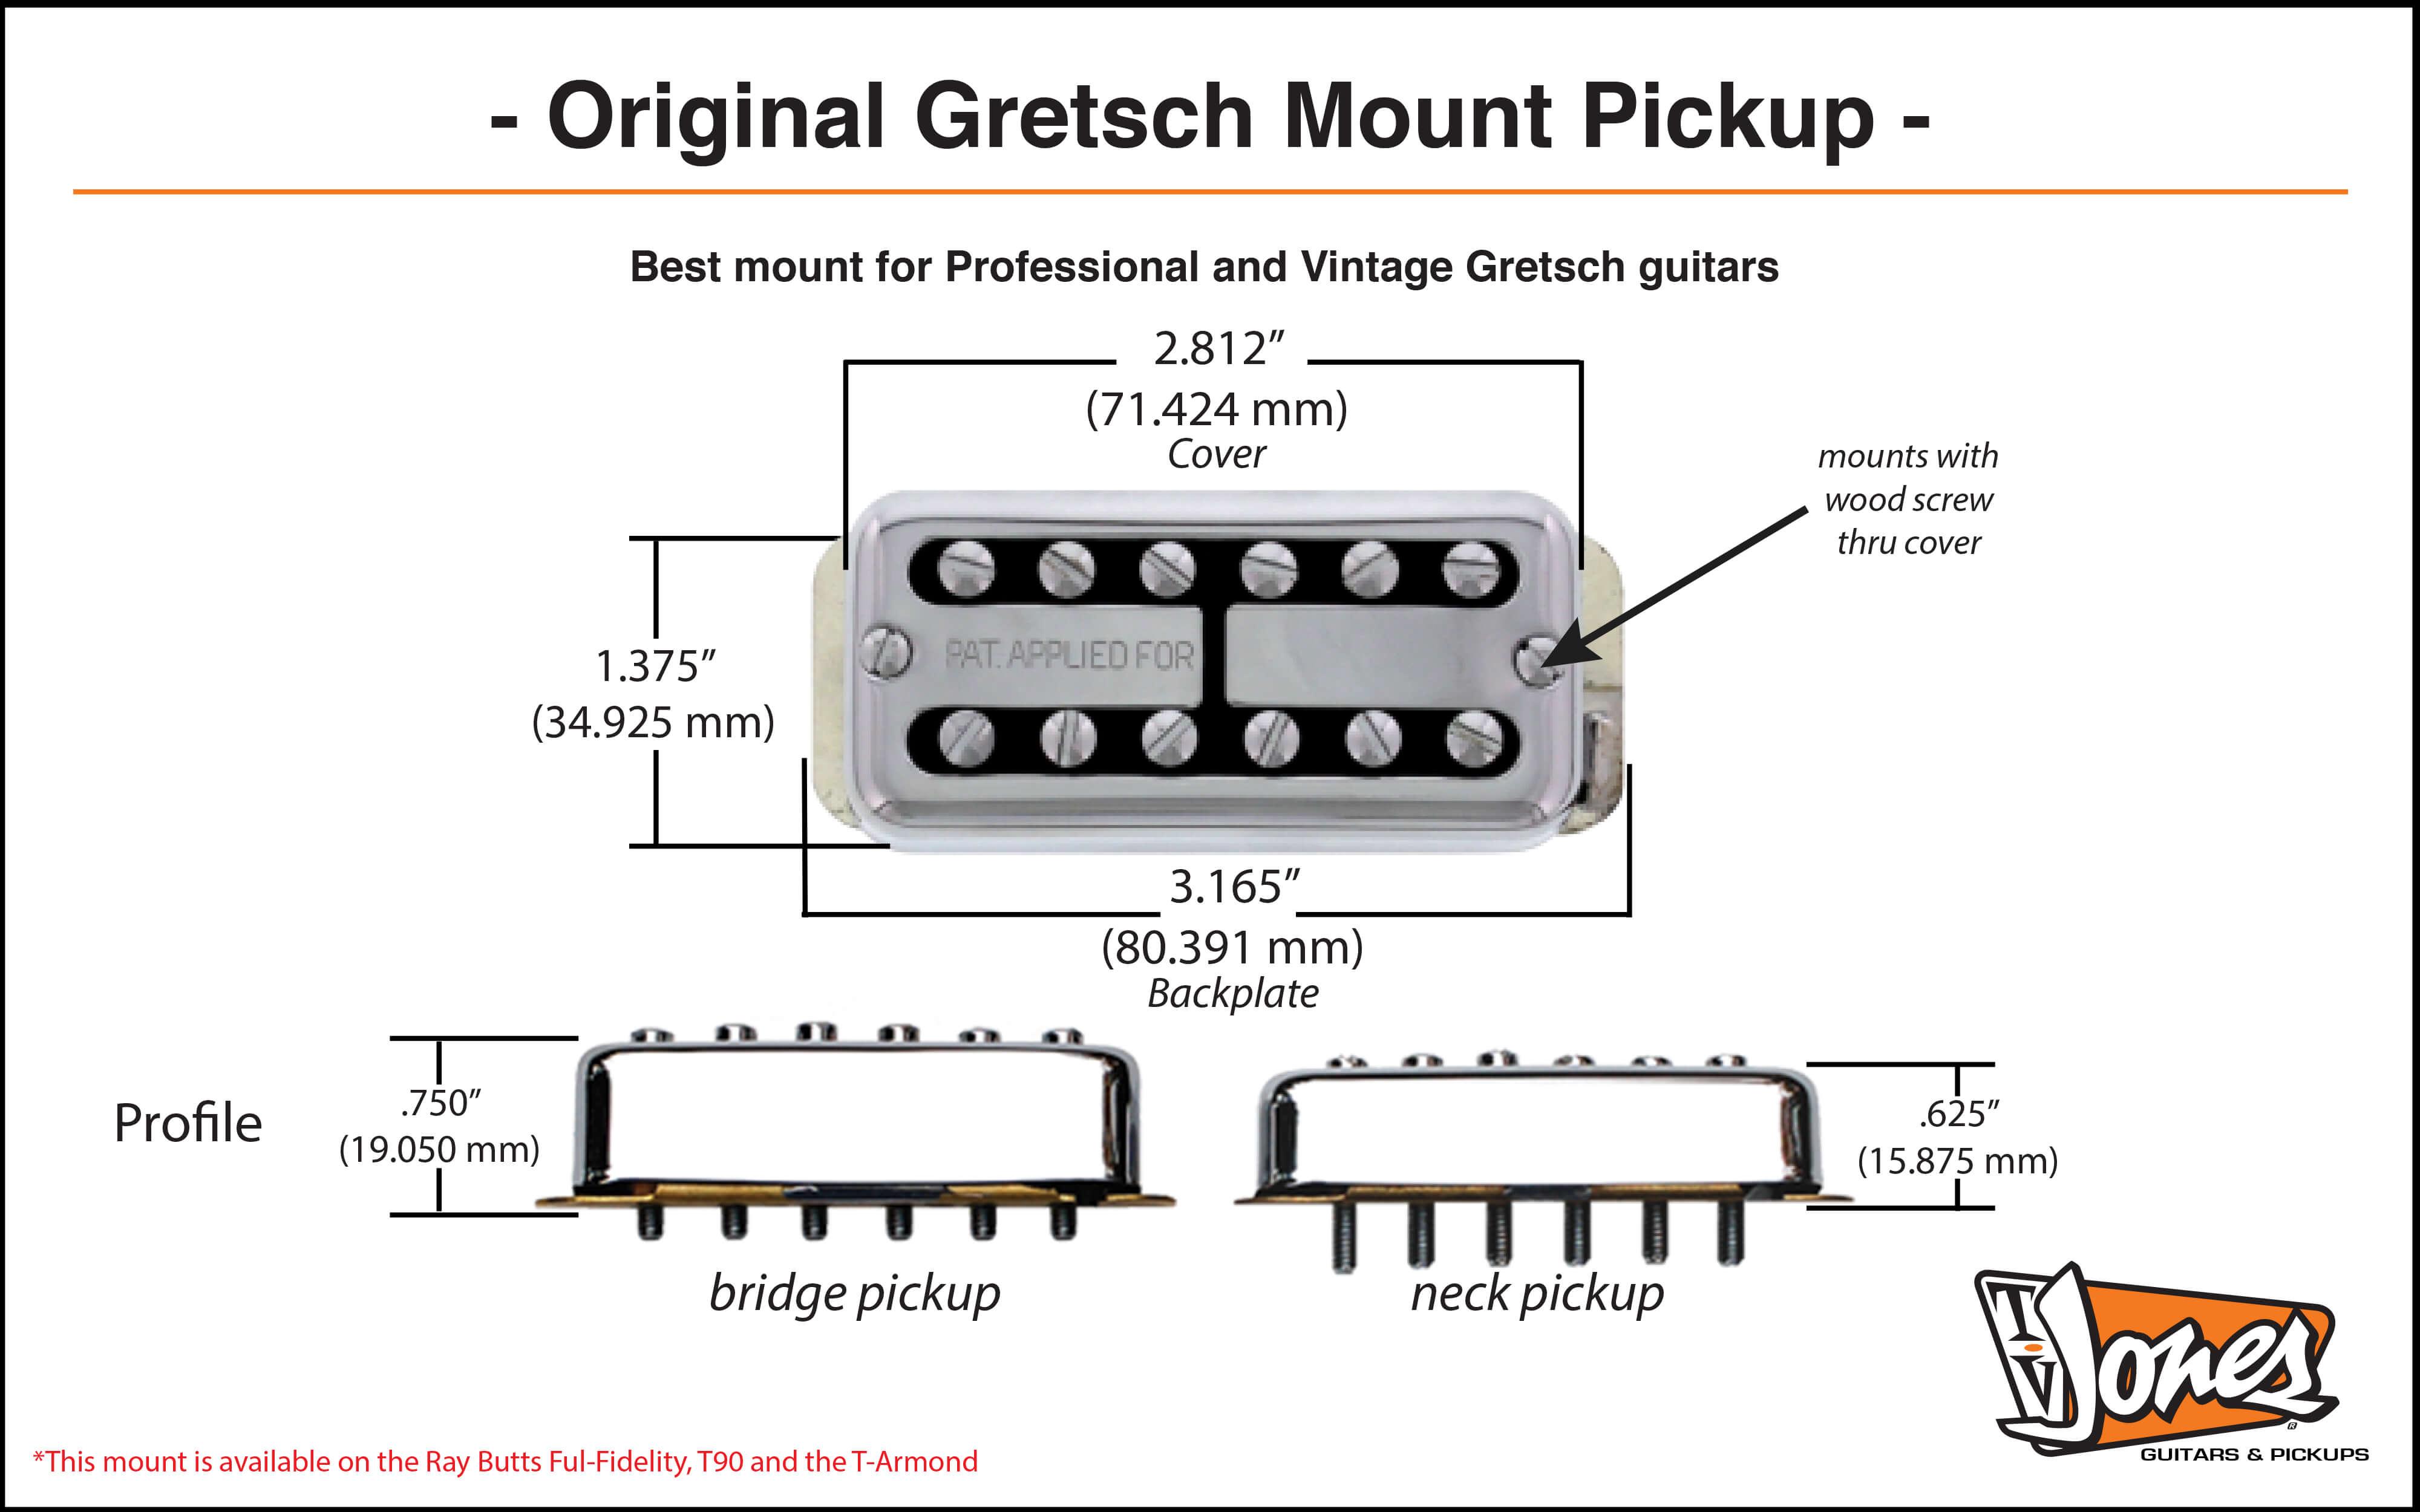 Original Gretsch Mount Dimensions